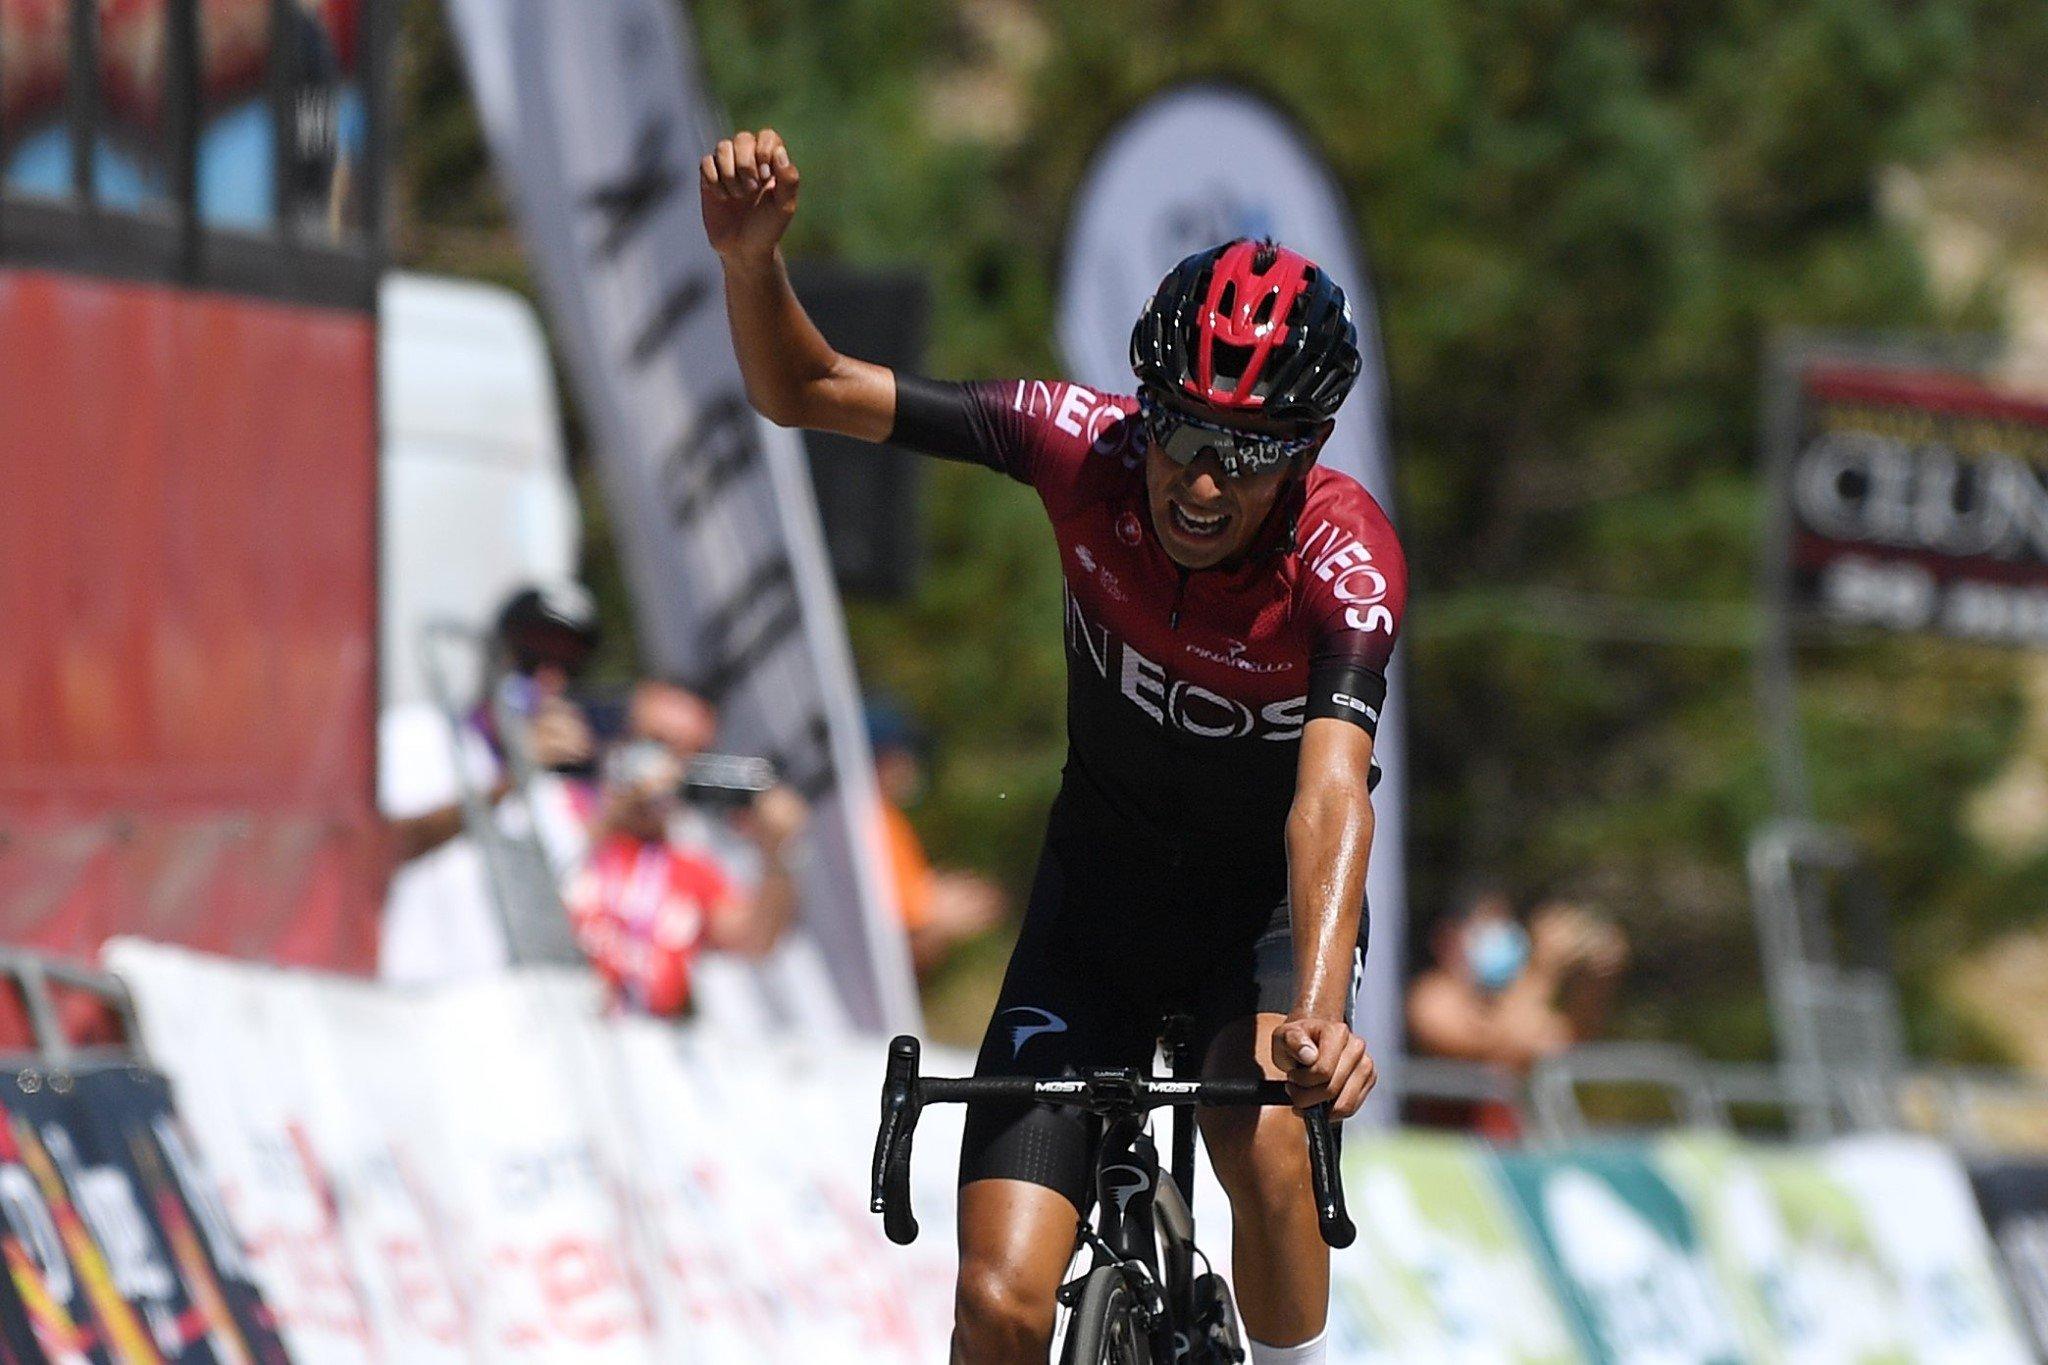 Evenepoel se lleva la Vuelta e Iván Ramiro Sosa vuelve a ganar en Neila - El Diario